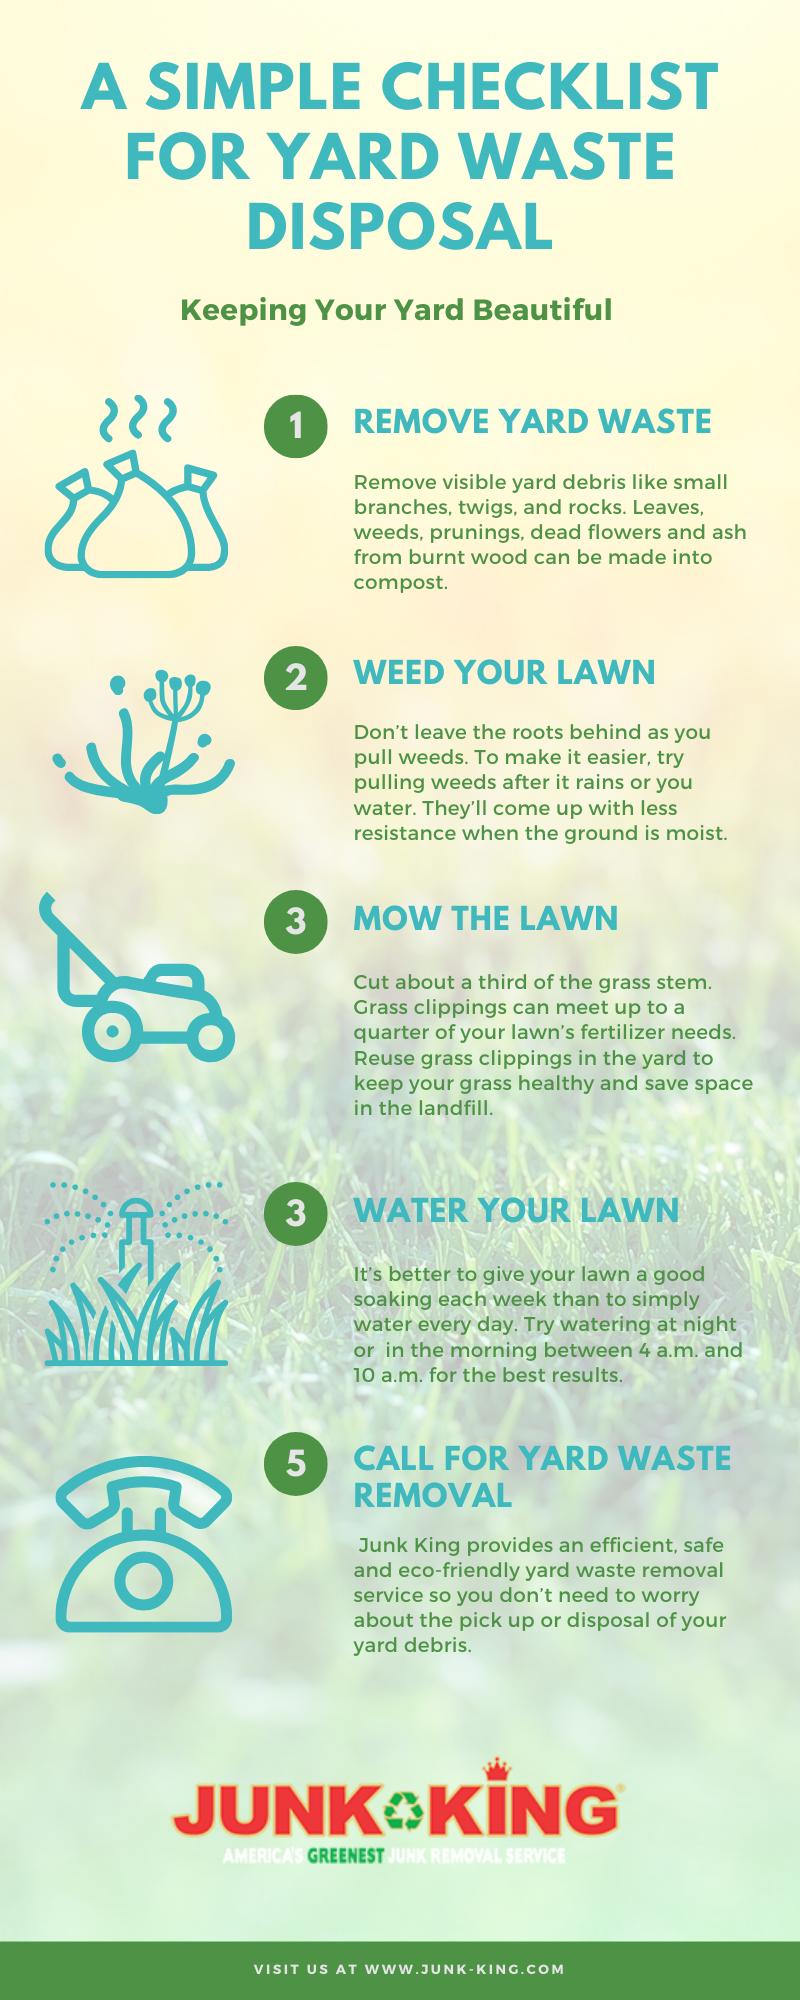 a simple checklist for yard waste disposal